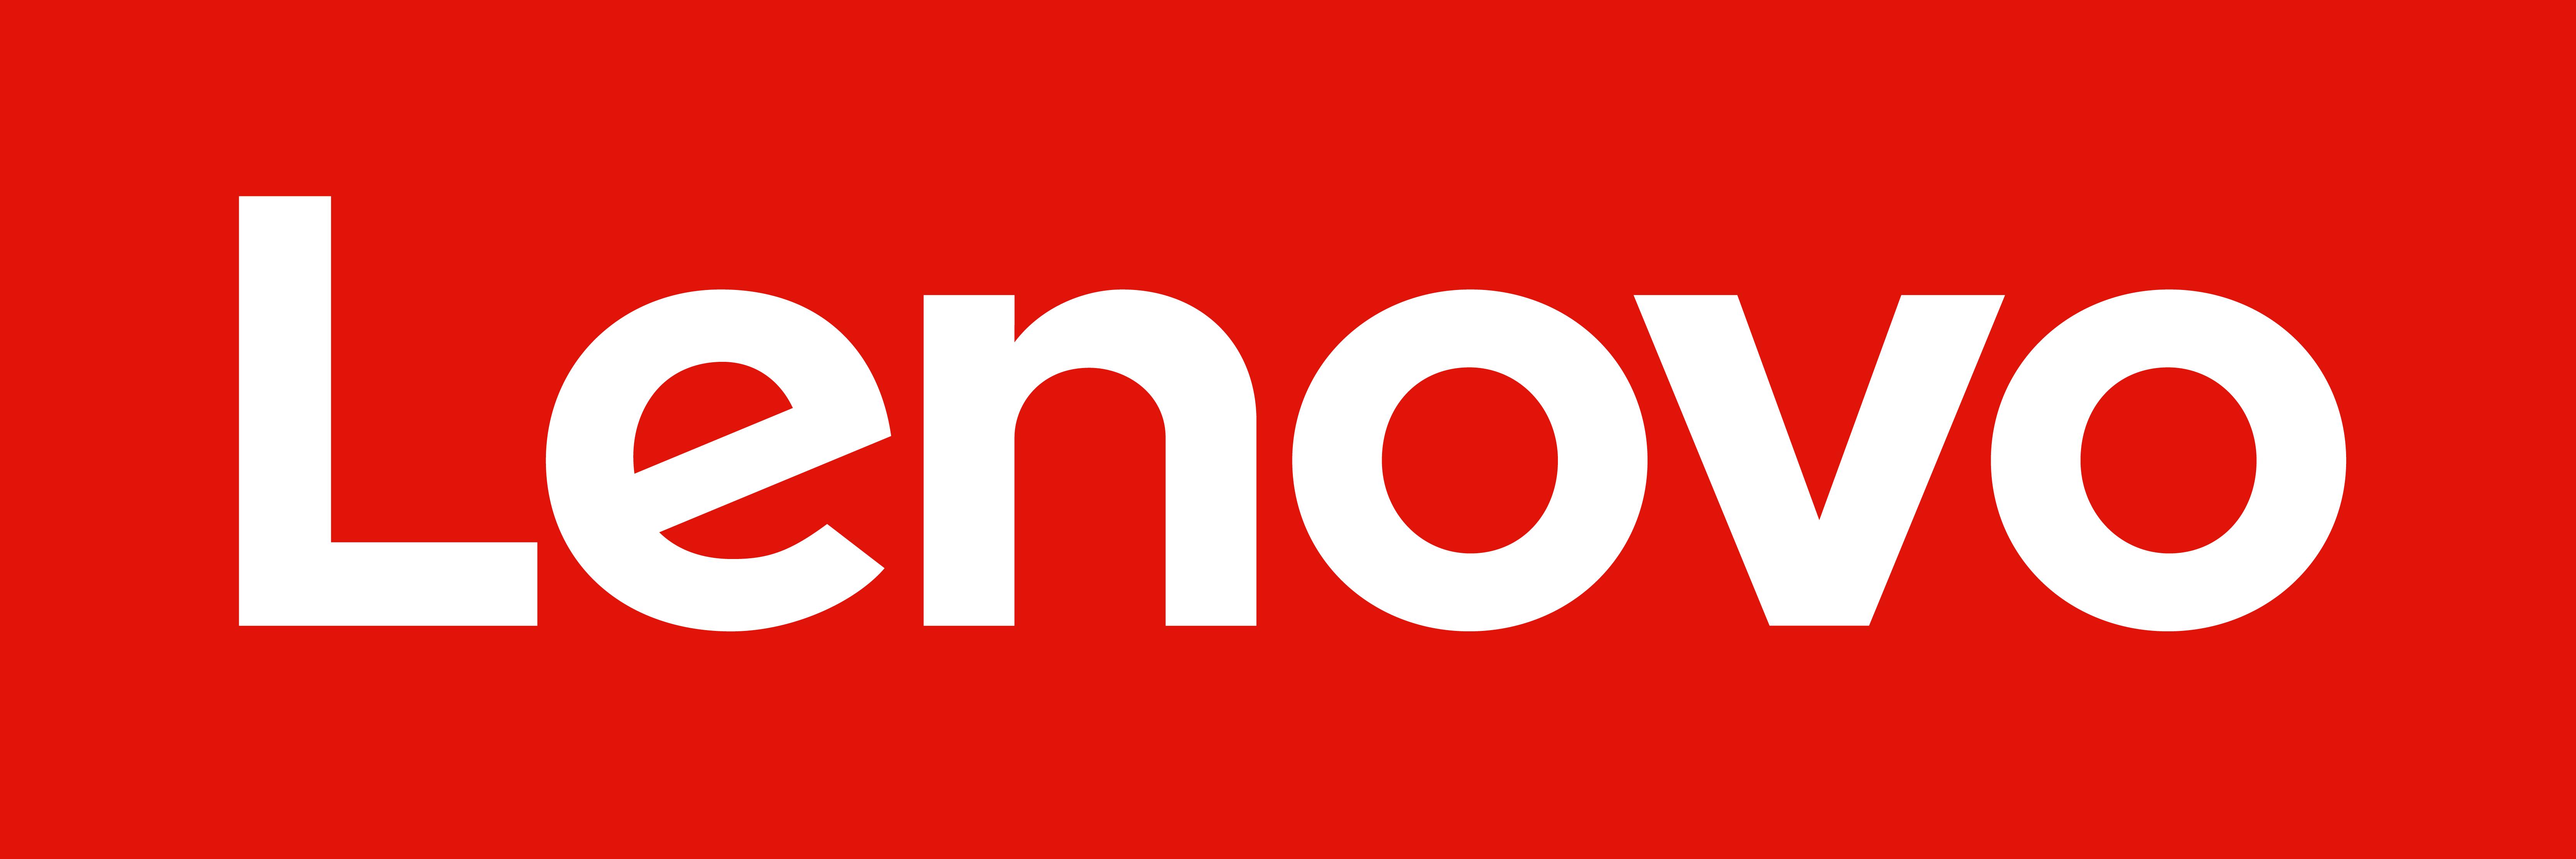 Lenovo Technology , logo